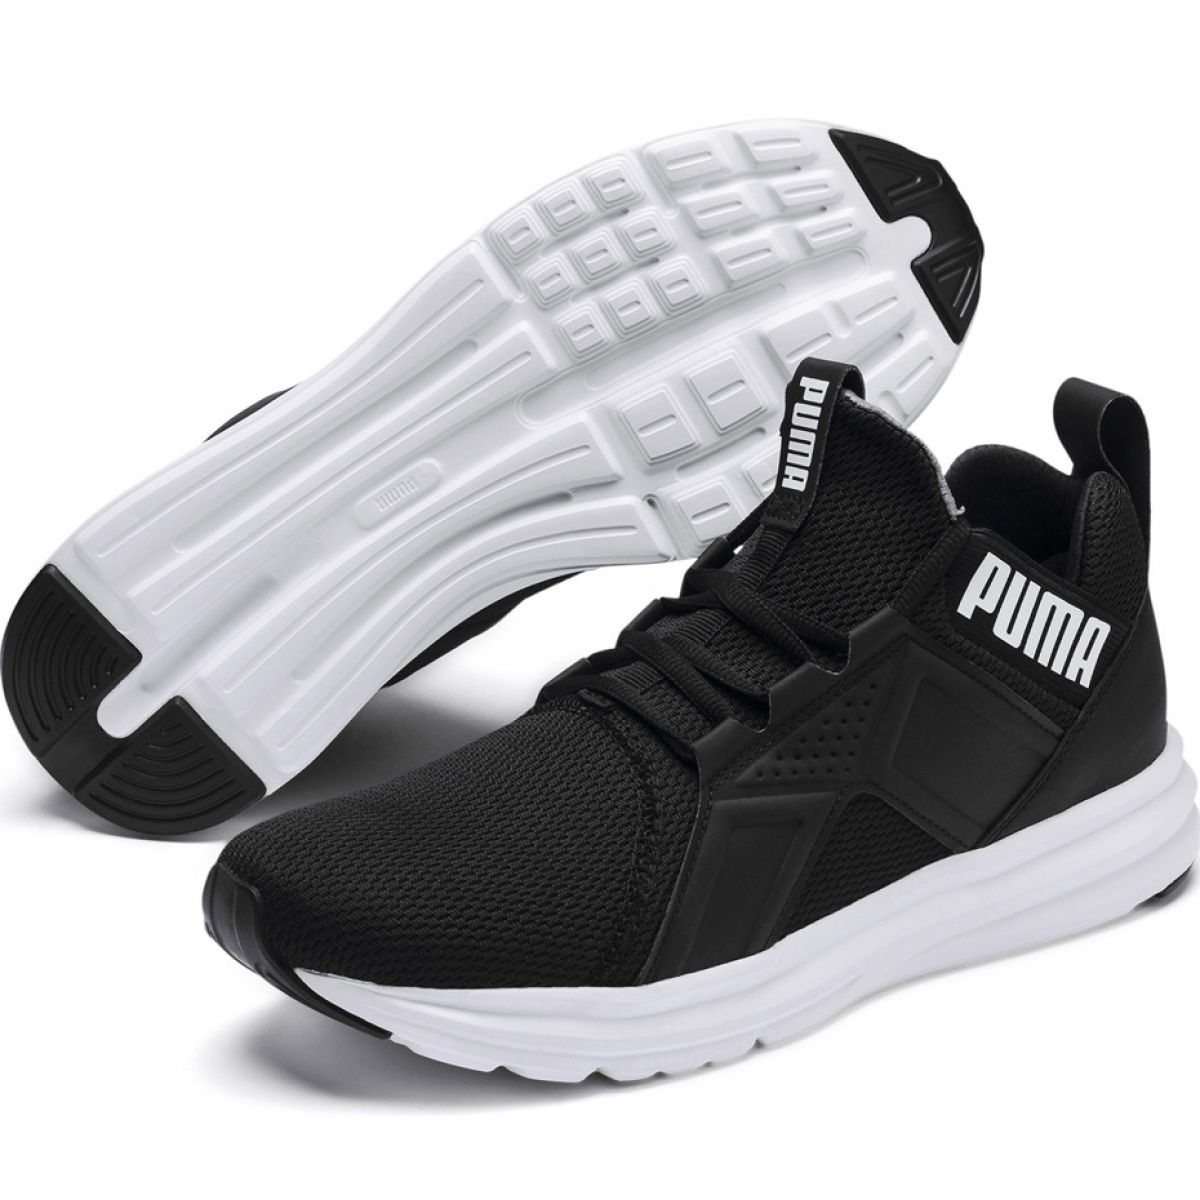 chaussure puma sport